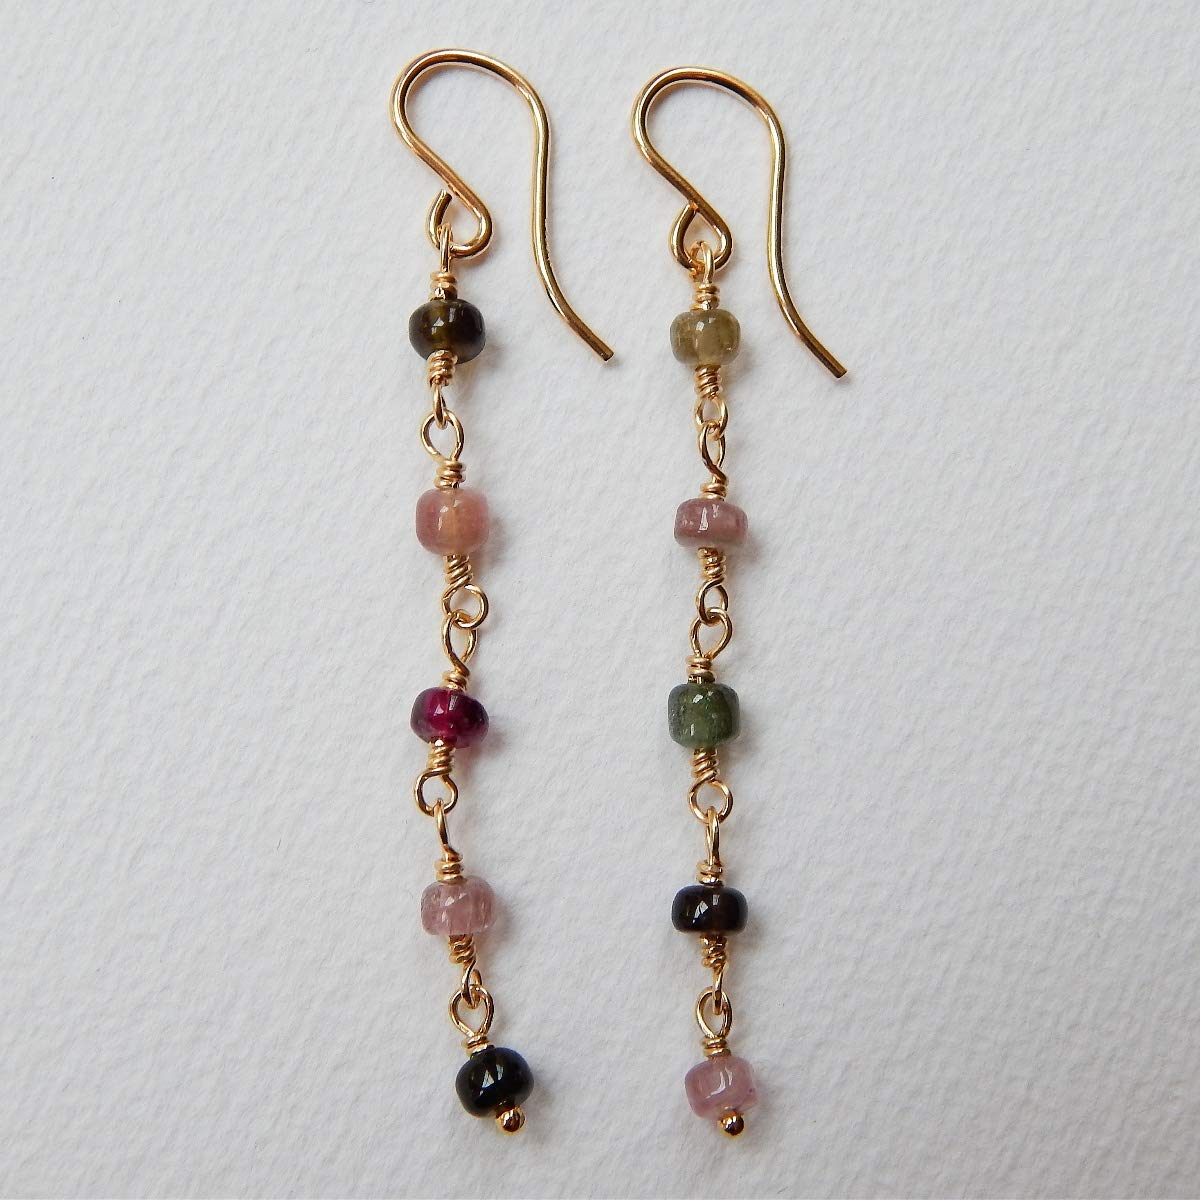 Moonstone Tourmaline Gold Hoop Earring Dreamcatcher Jewelry